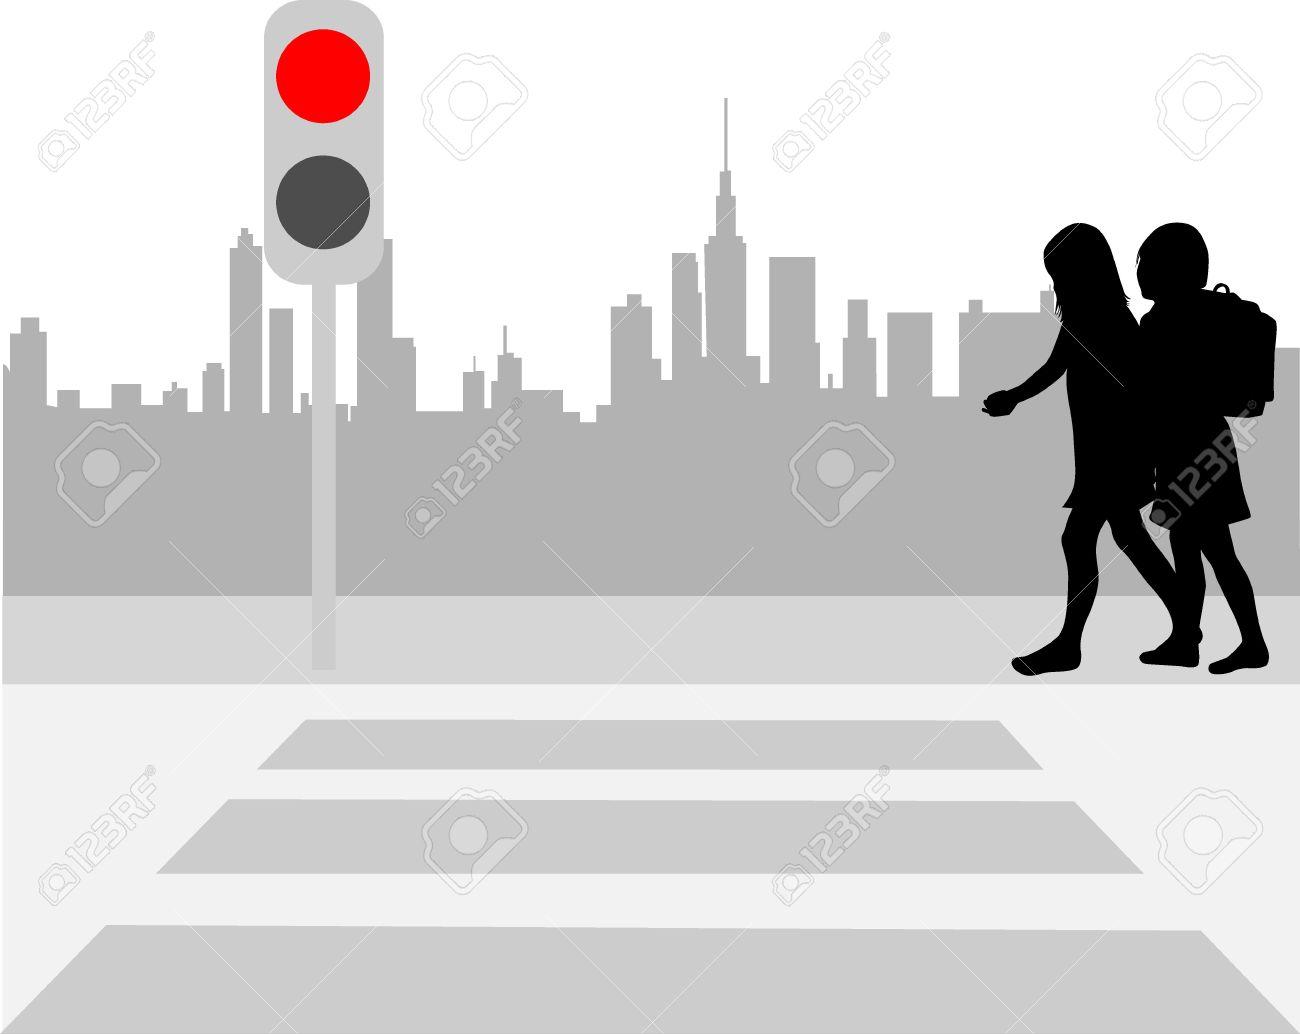 Pedestriam crossing silhouette clipart.